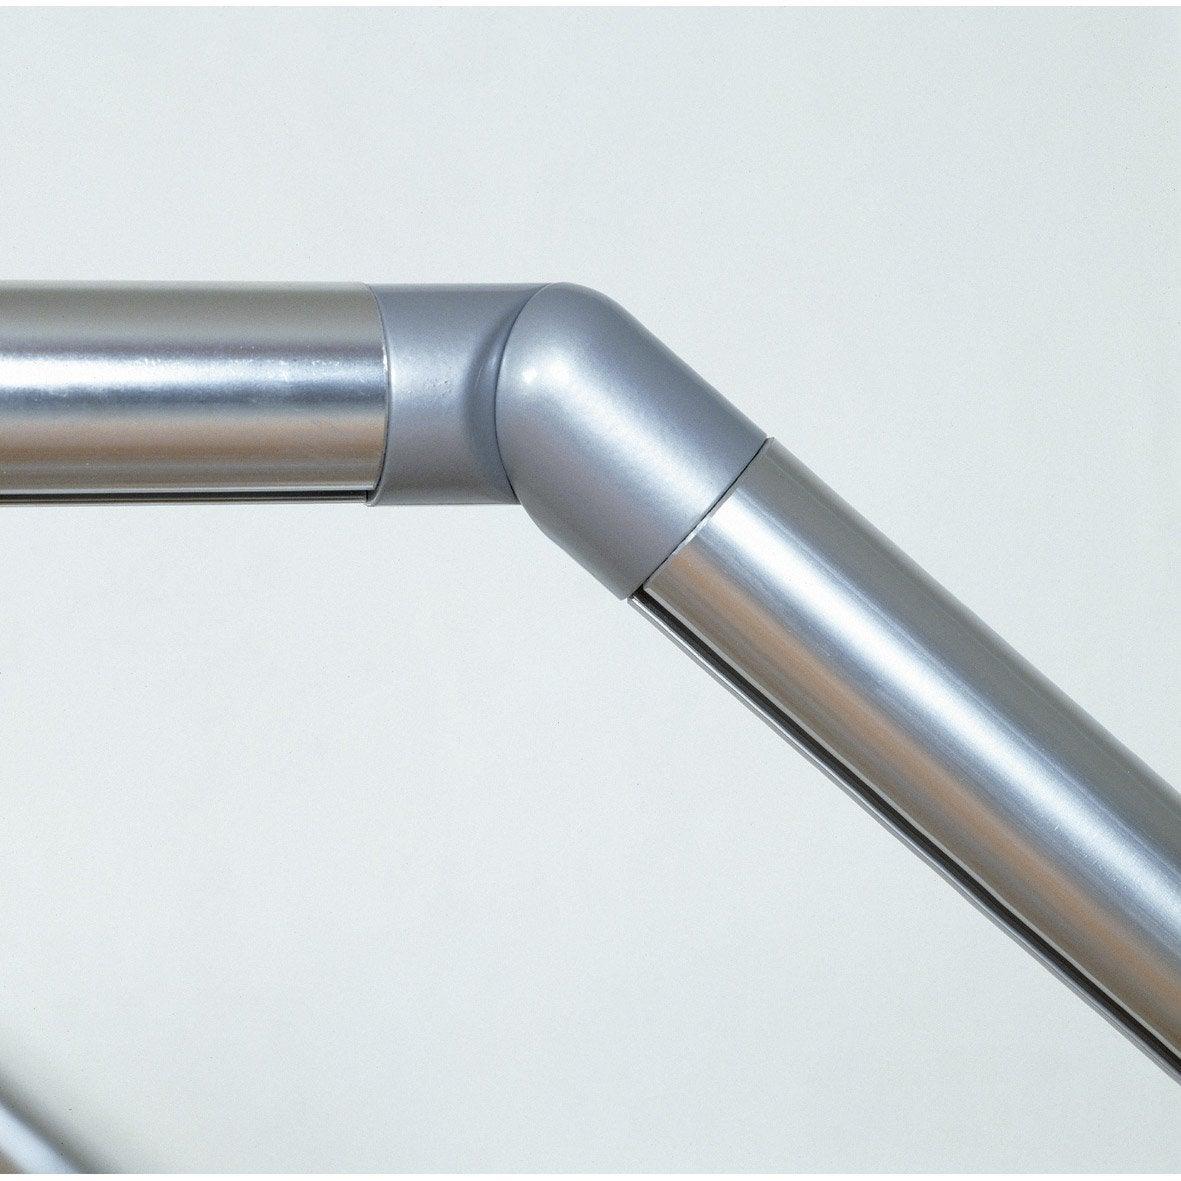 Articulation alu gris pour main courante leroy merlin for Main courante bois exterieur